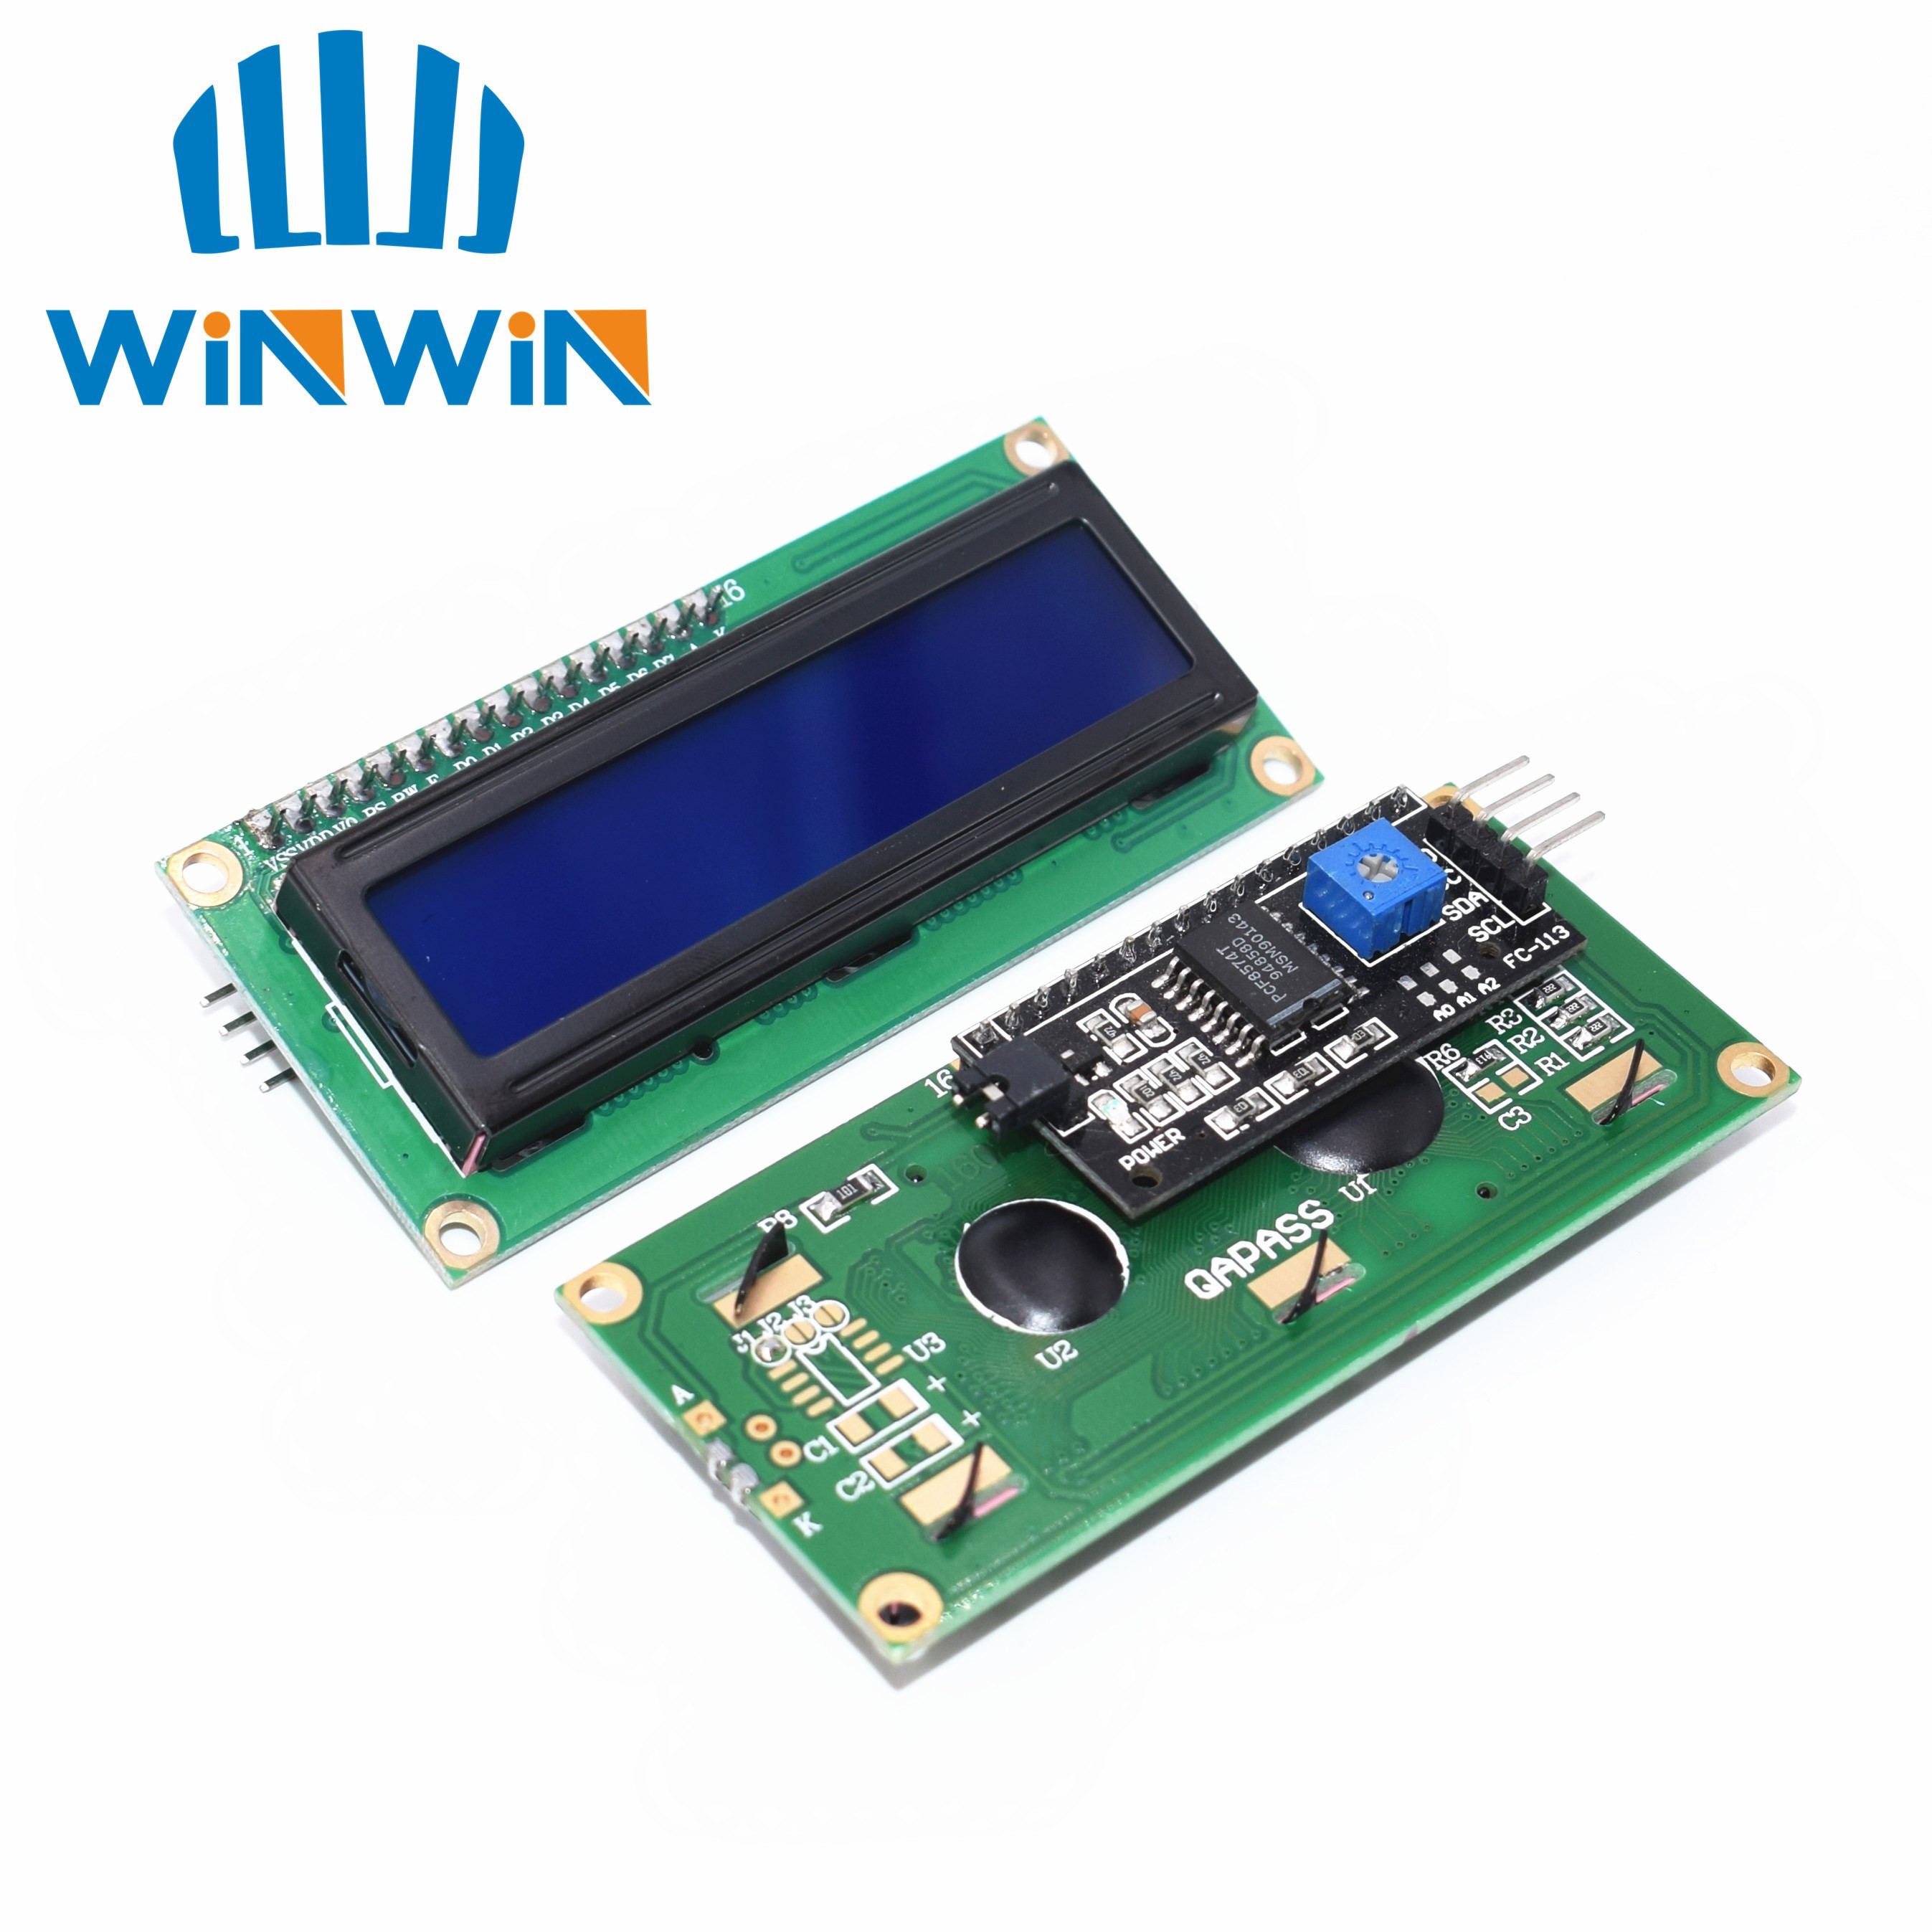 10pcs LCD1602+I2C LCD 1602 module Blue /yellow green screen IIC/I2C LCD1602 IIC LCD1602 Adapter plate